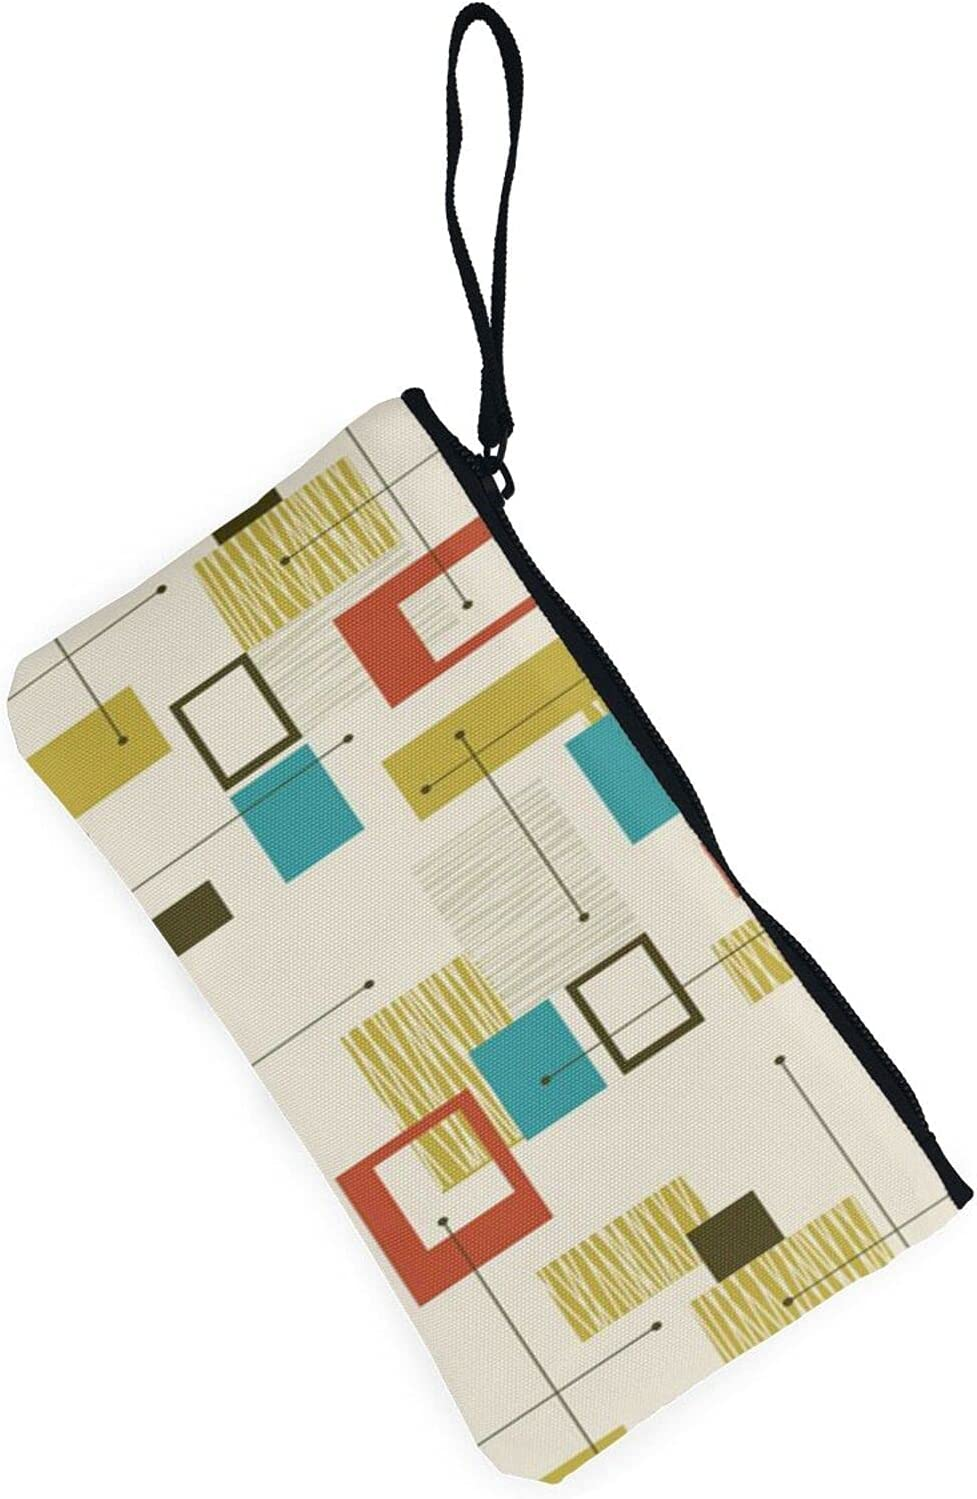 AORRUAM Mid Century Modern Canvas Coin Purse,Canvas Zipper Pencil Cases,Canvas Change Purse Pouch Mini Wallet Coin Bag